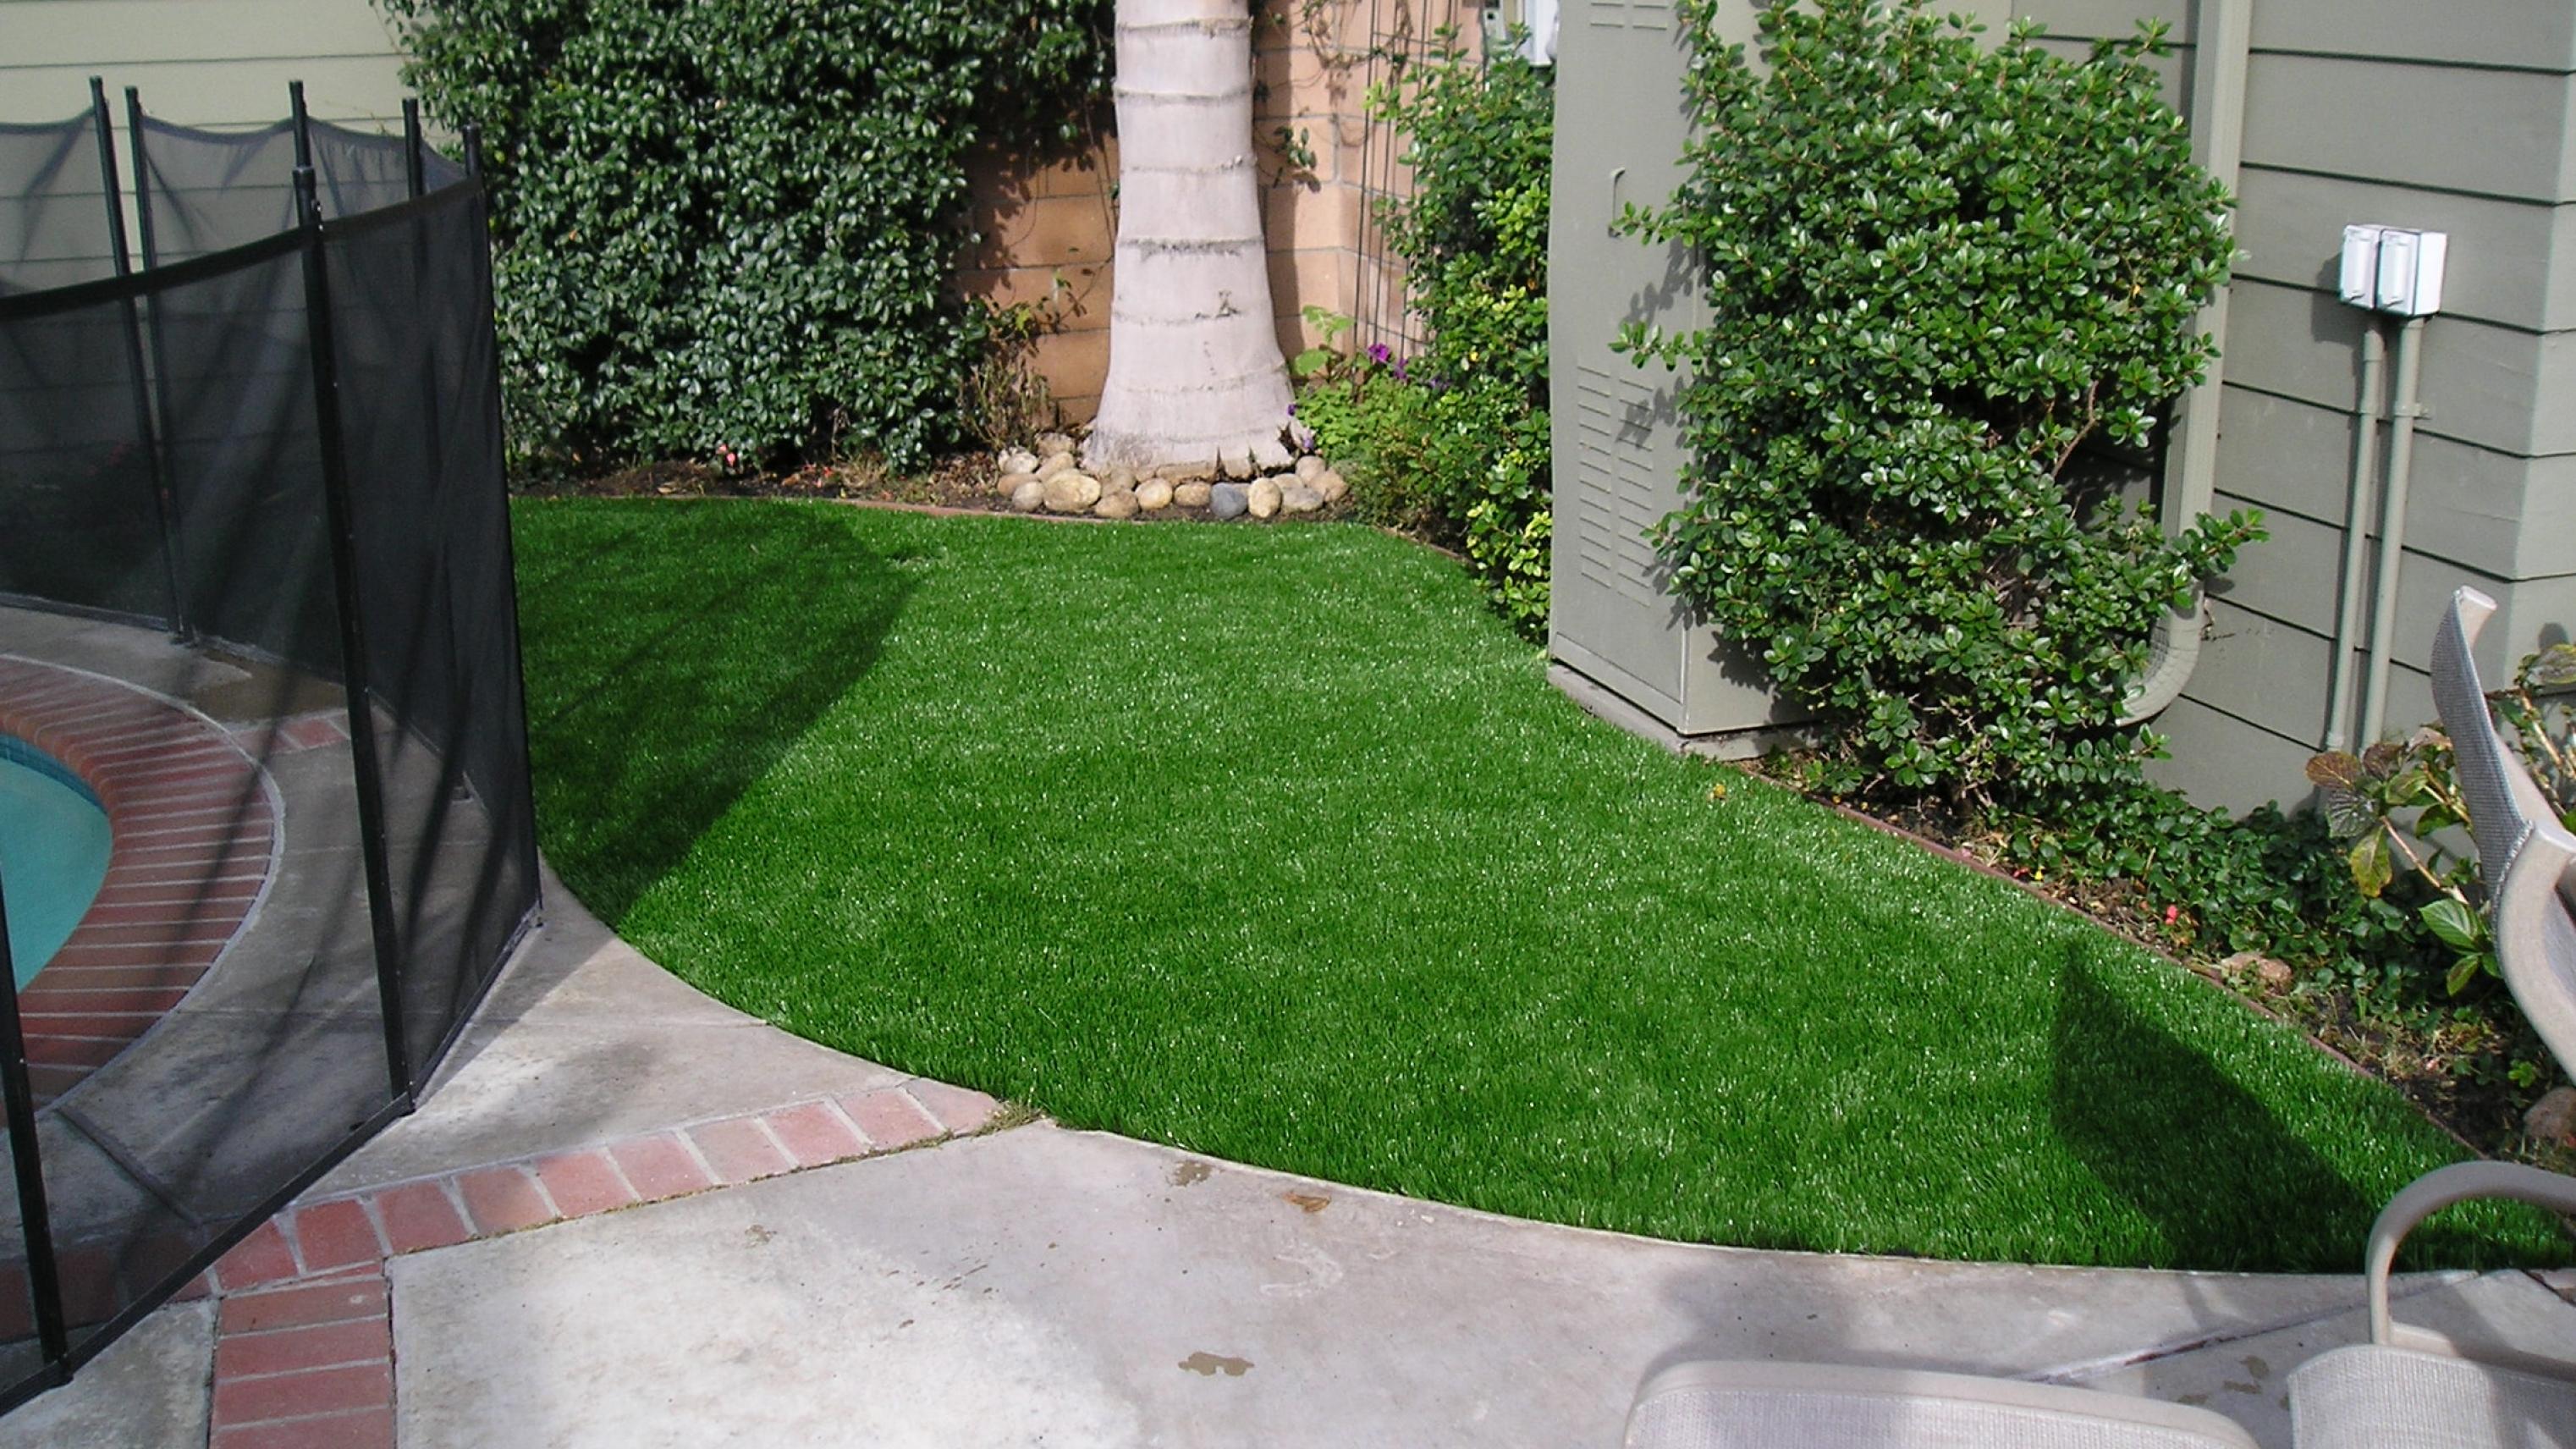 S Blade-90 fake grass for yard,backyard turf,turf backyard,turf yard,fake grass for backyard,used artificial turf